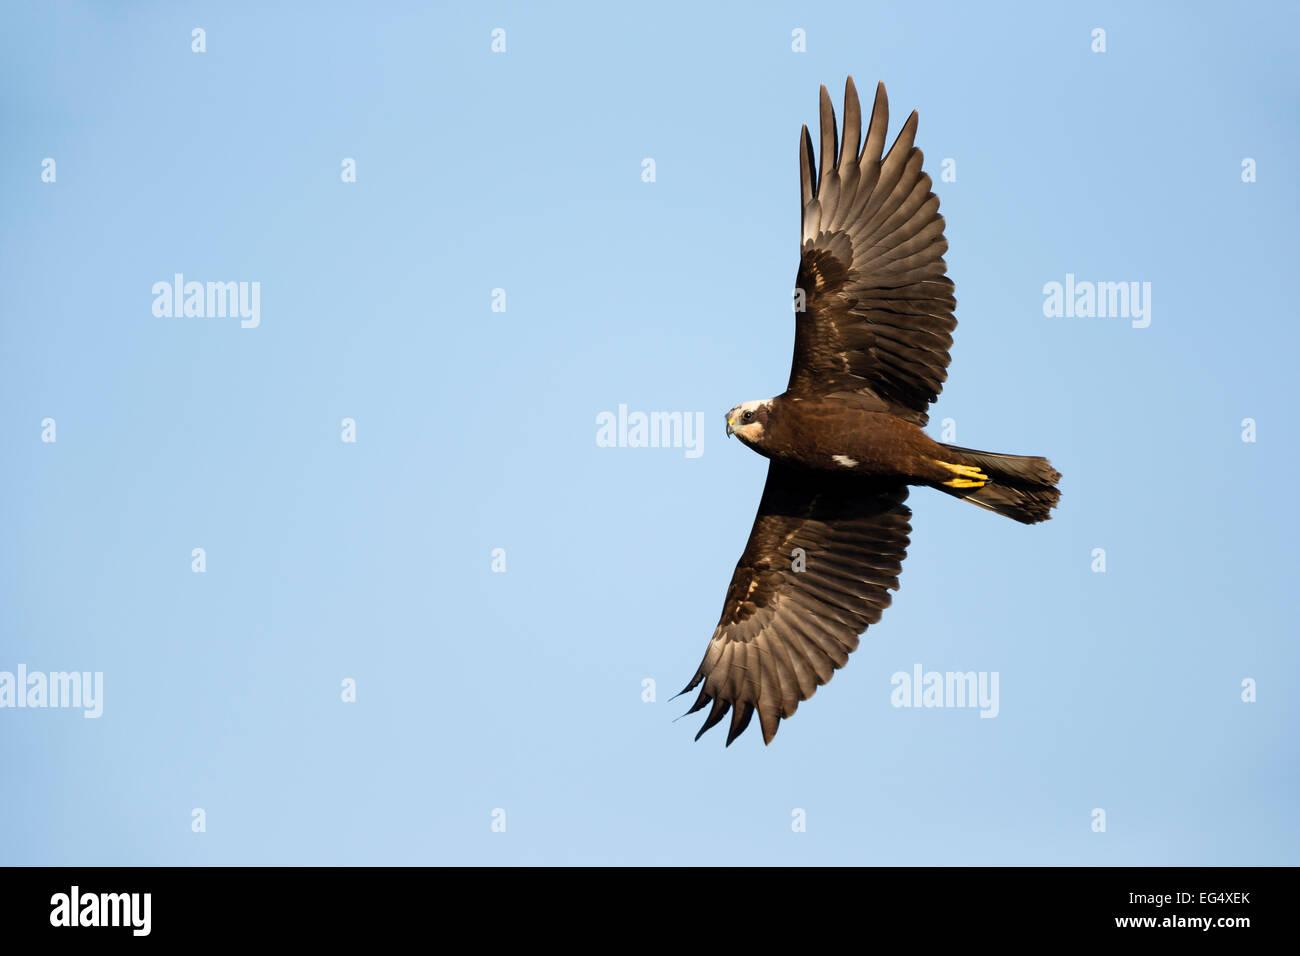 Marsh harrier (Circus aeruginosus) in flight against a clear blue sky; Cambridgeshire England UK Stock Photo